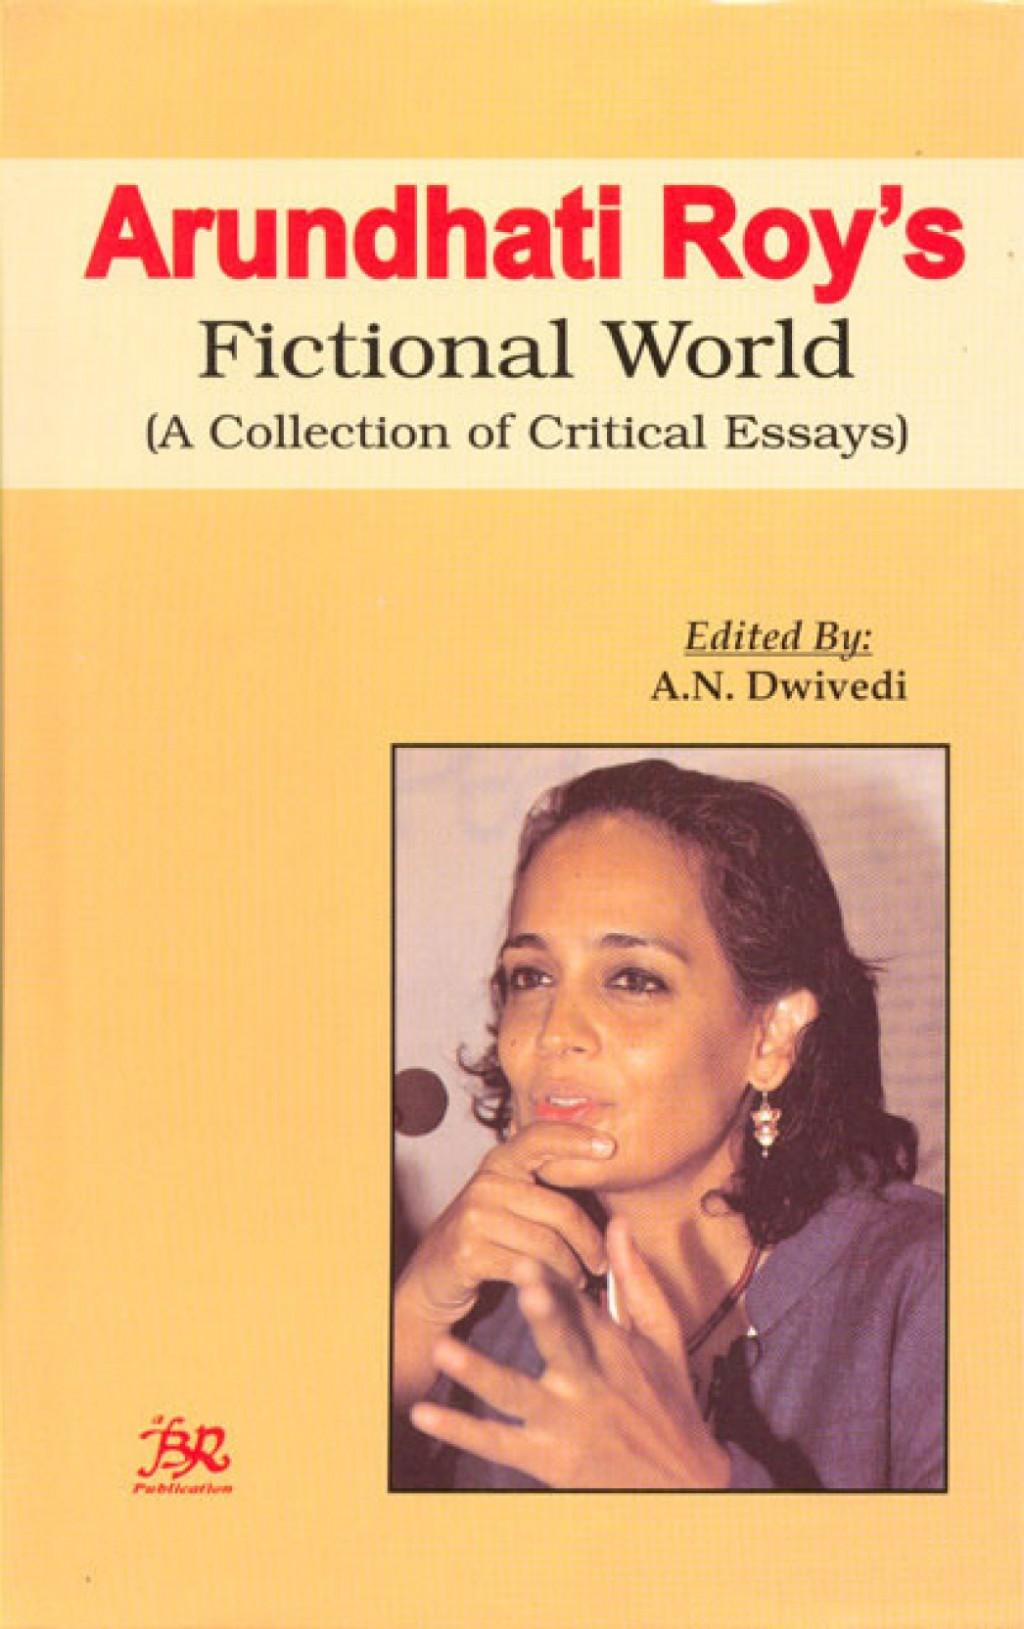 018 Essays By Arundhati Roy Essay Example Arundhuti Roys Fictional World Original Sensational Large